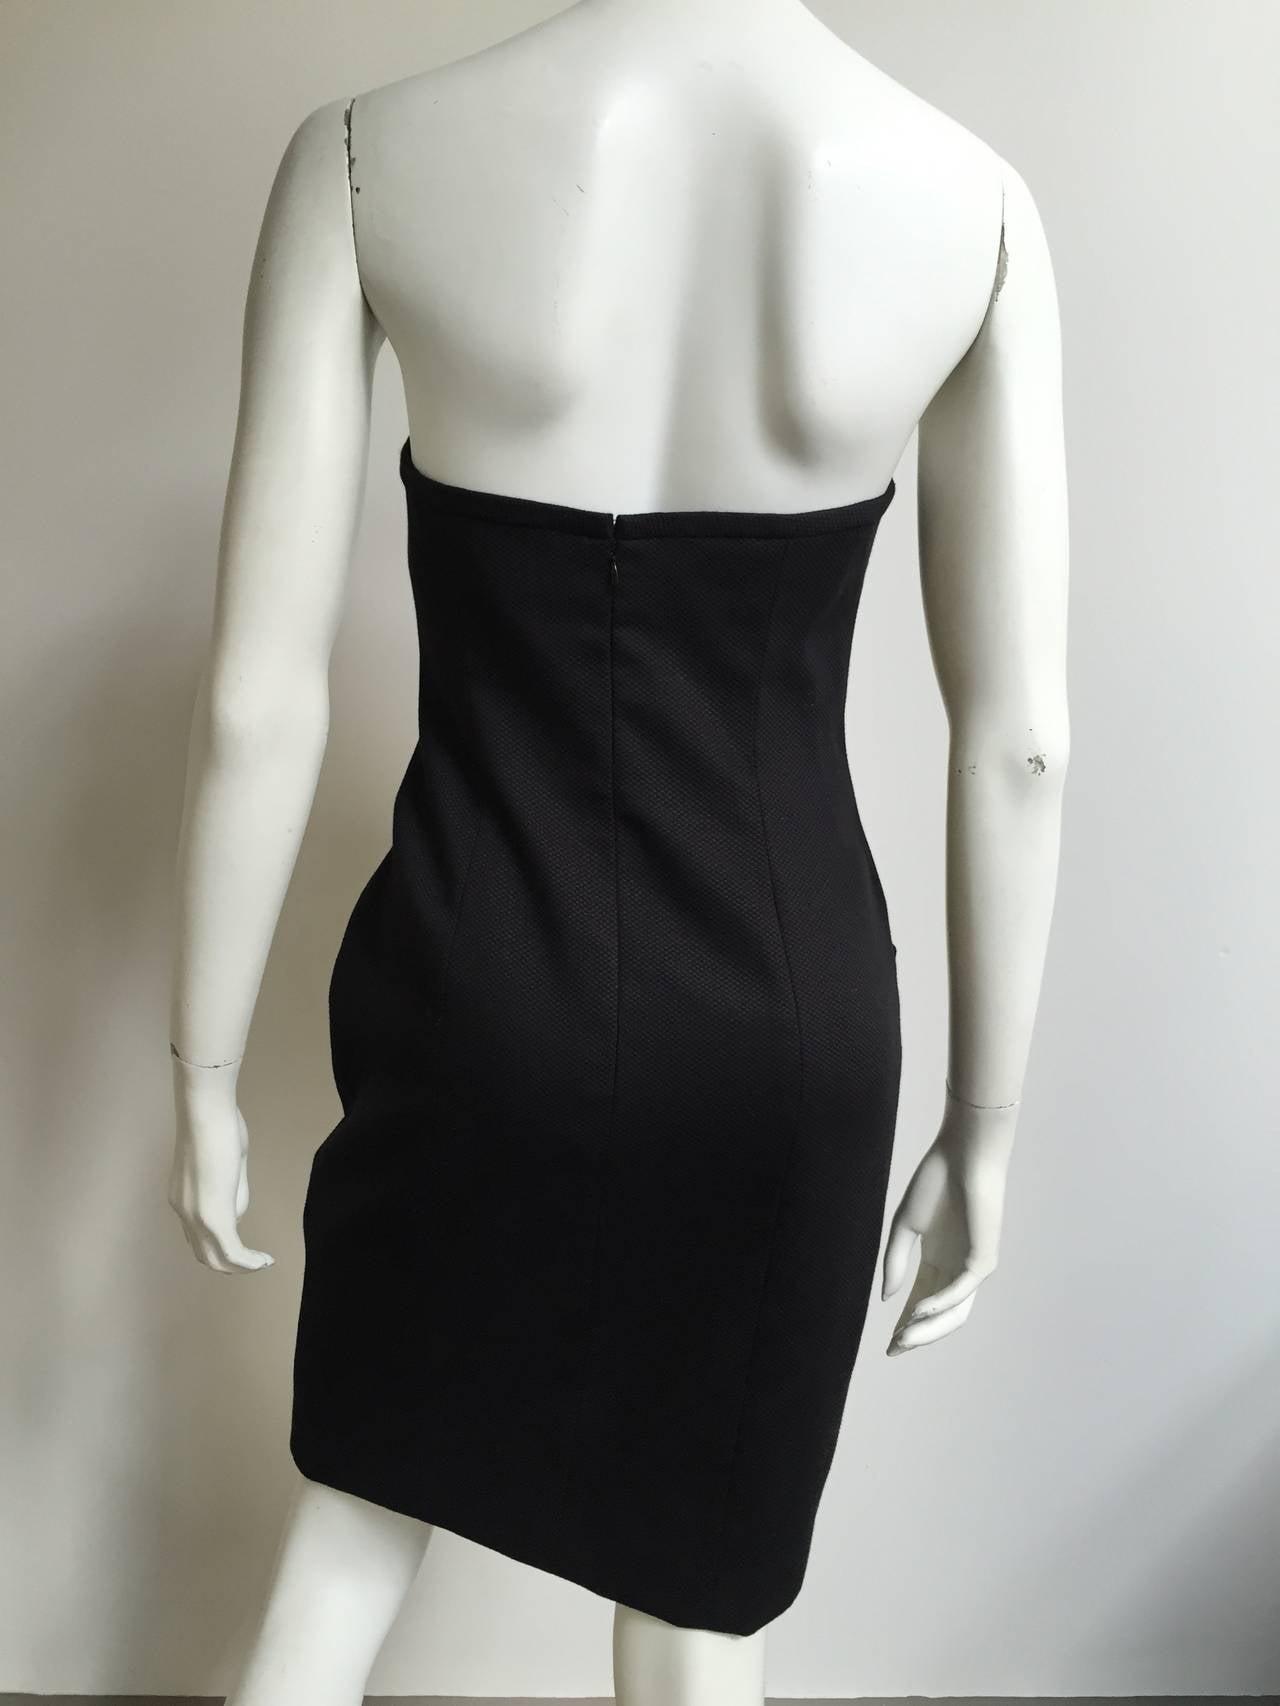 Bill Blass 90s Black Strapless Dress With Pockets Size 4. 6